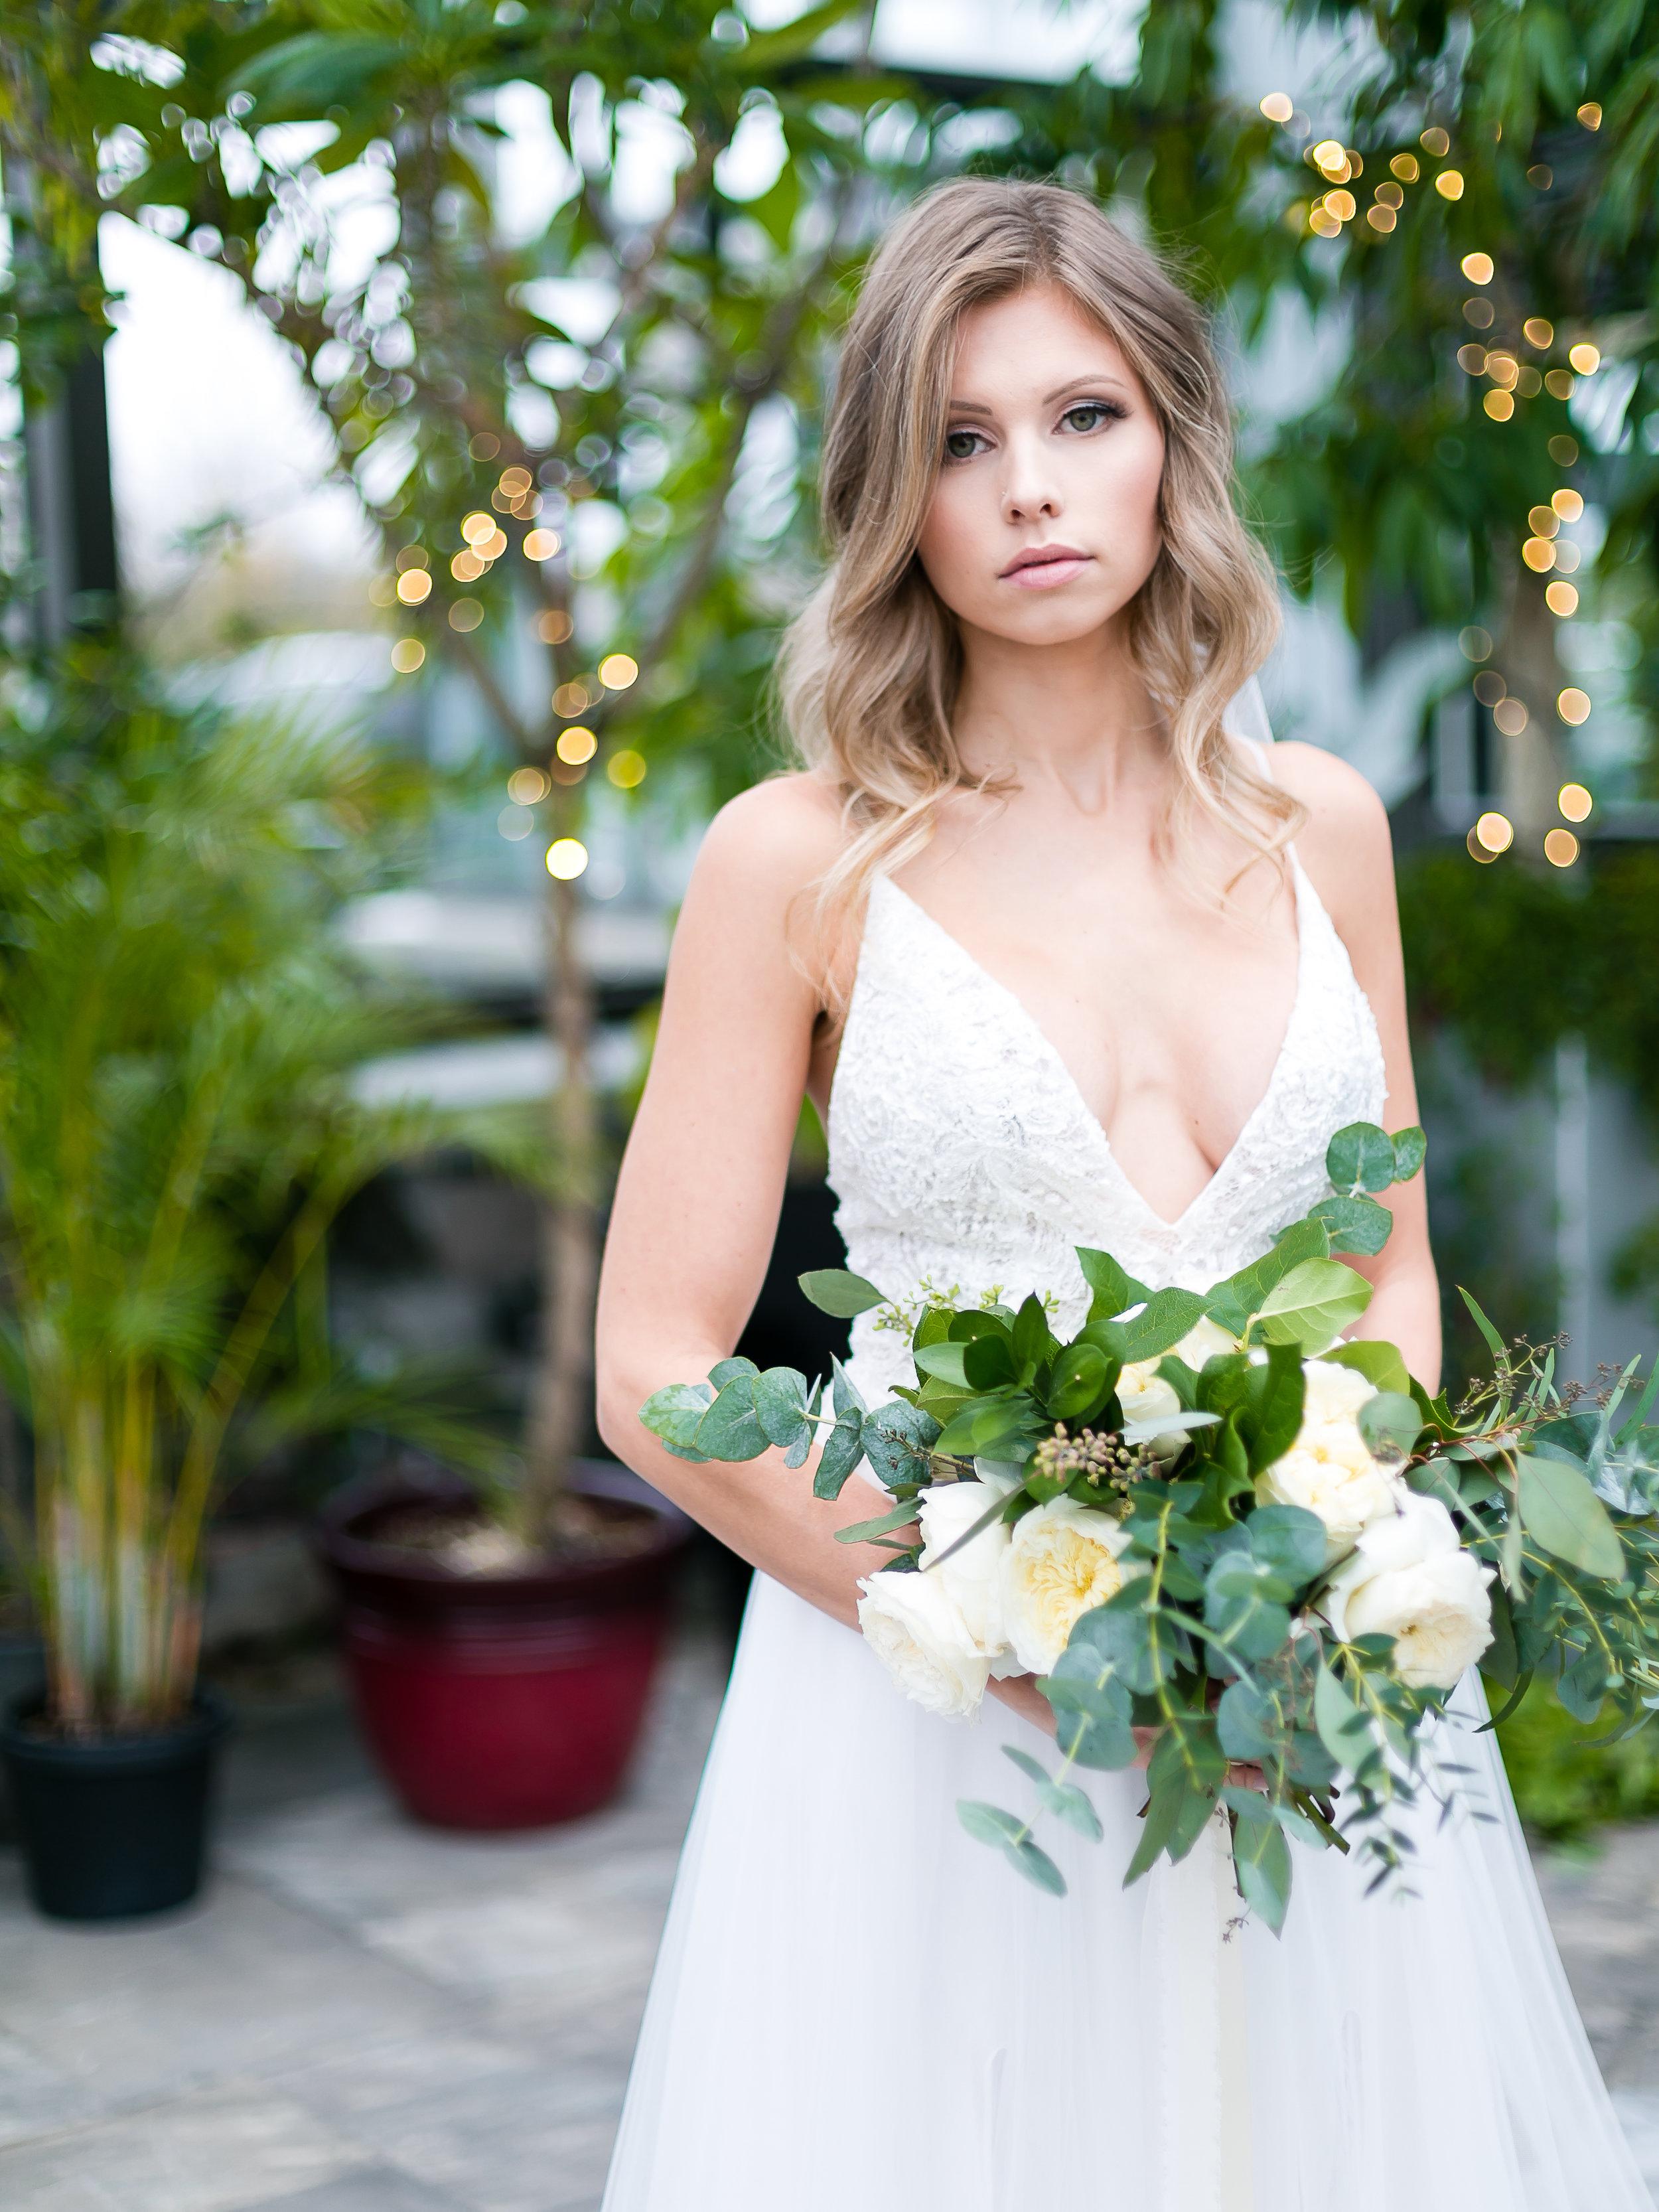 Aquatopia-Wedding-Ottawa-Wedding-Photographer-Stephanie-Mason-Photography-245.jpg